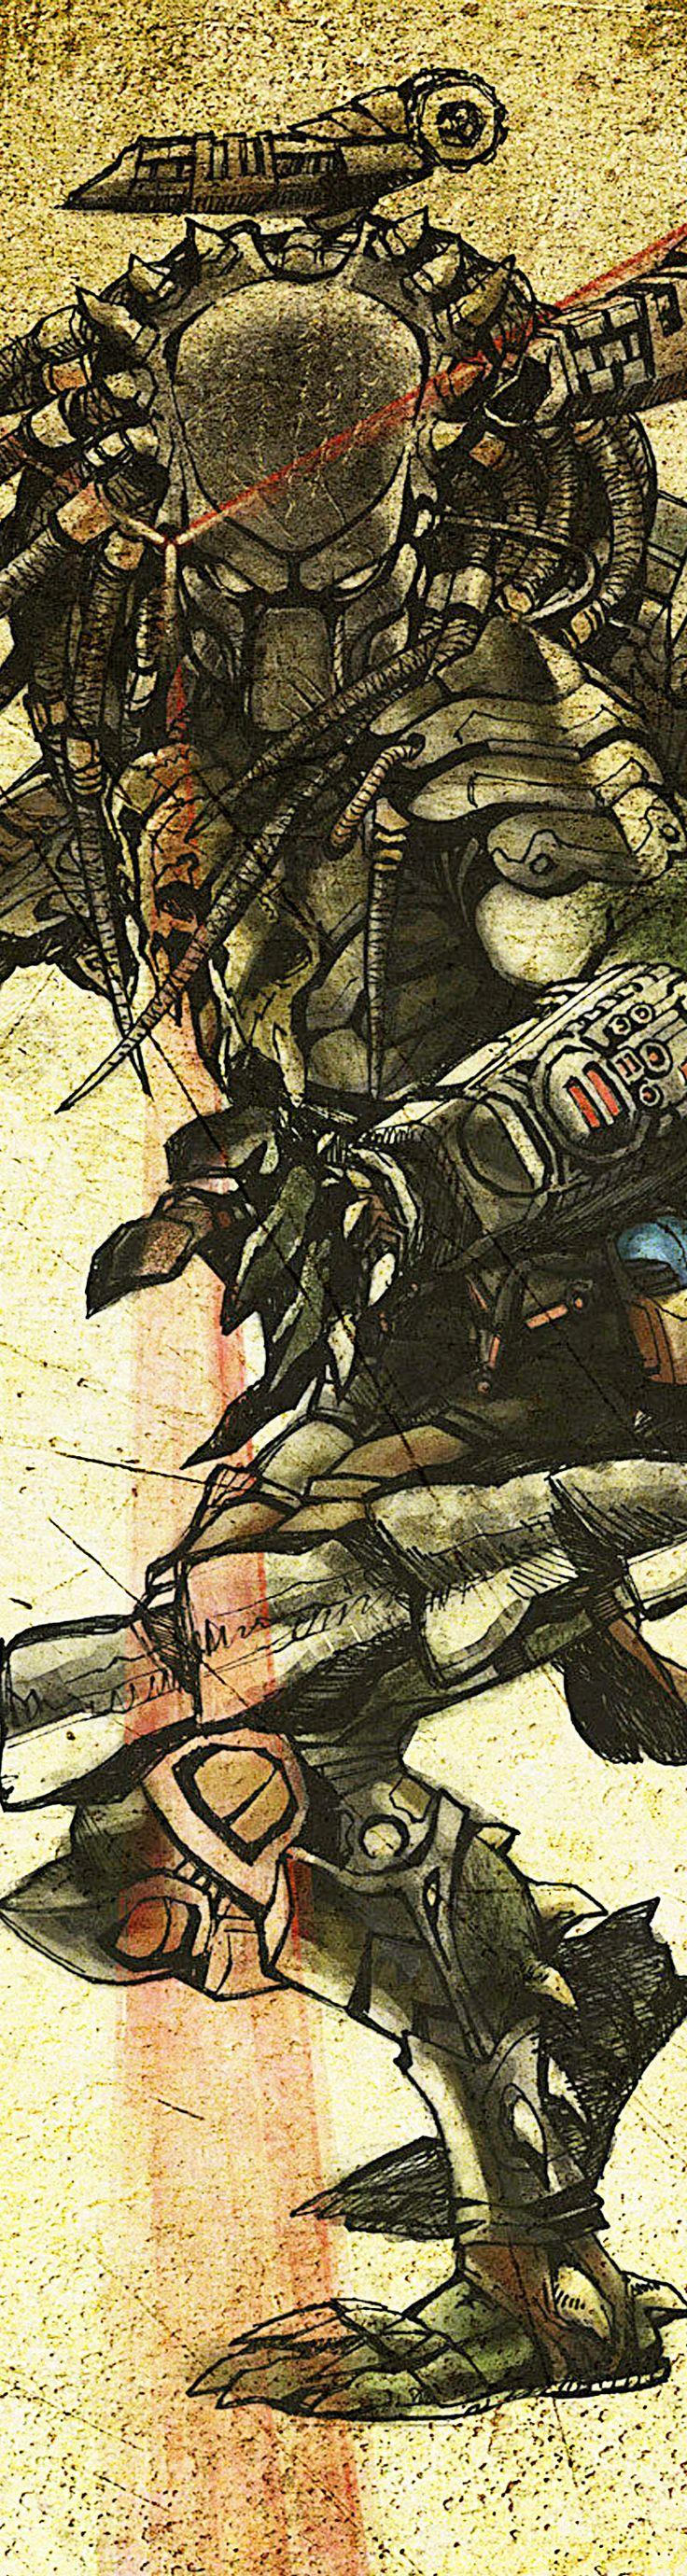 Predator, great background, love the concept